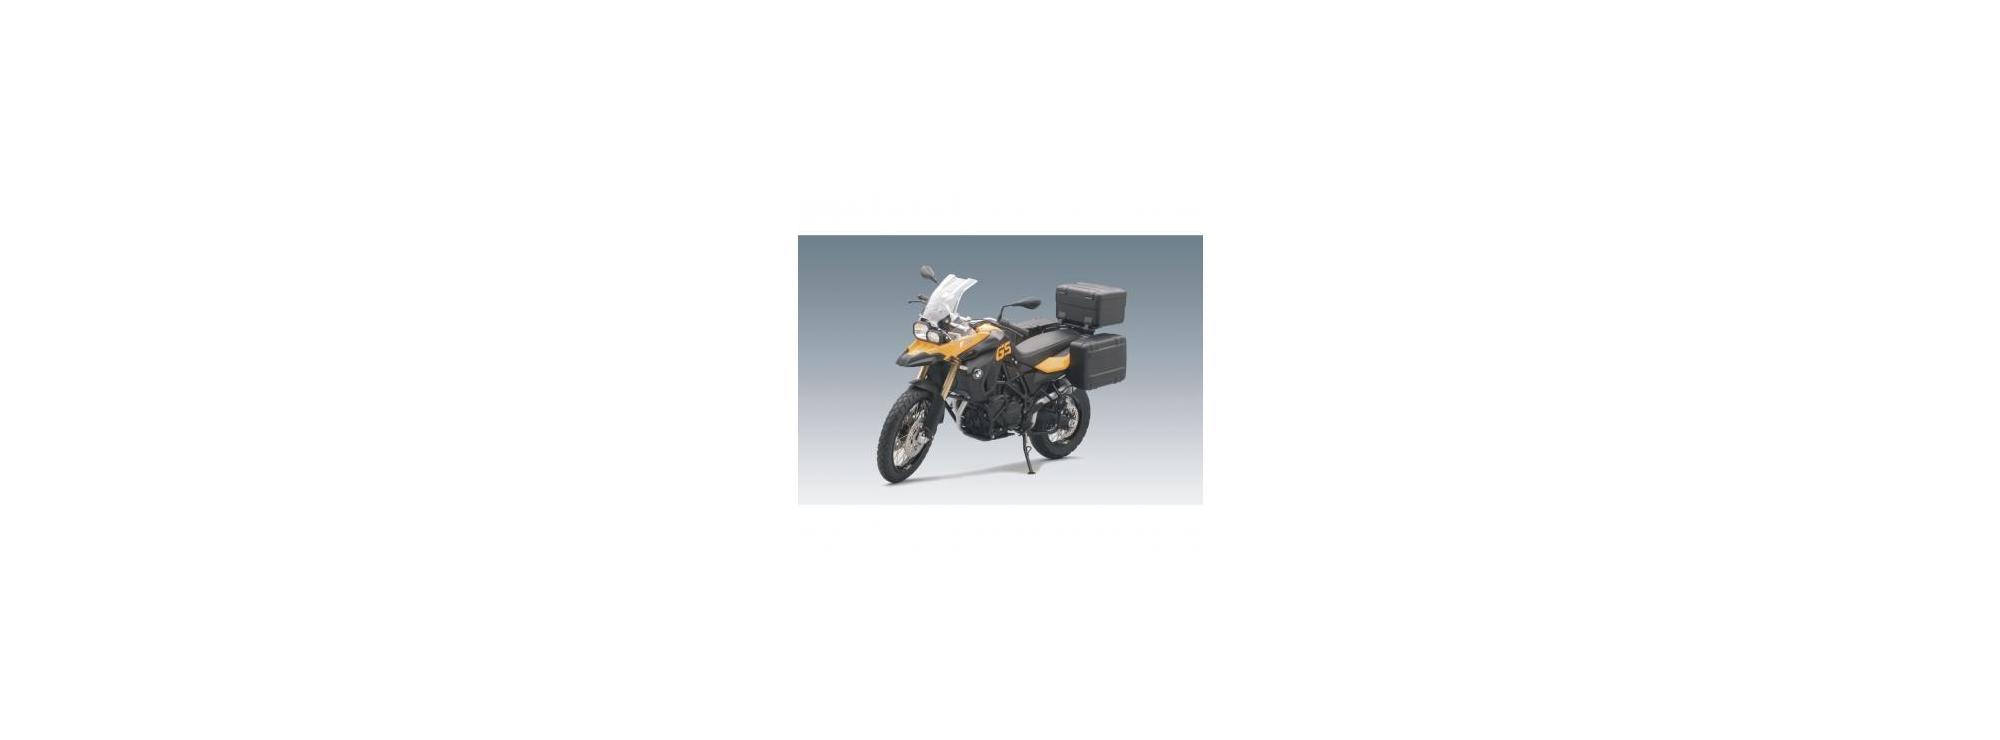 Ausverkauft 10007 Autoart Bmw F 800 Gs Modell Motorrad 1 10 Gelb